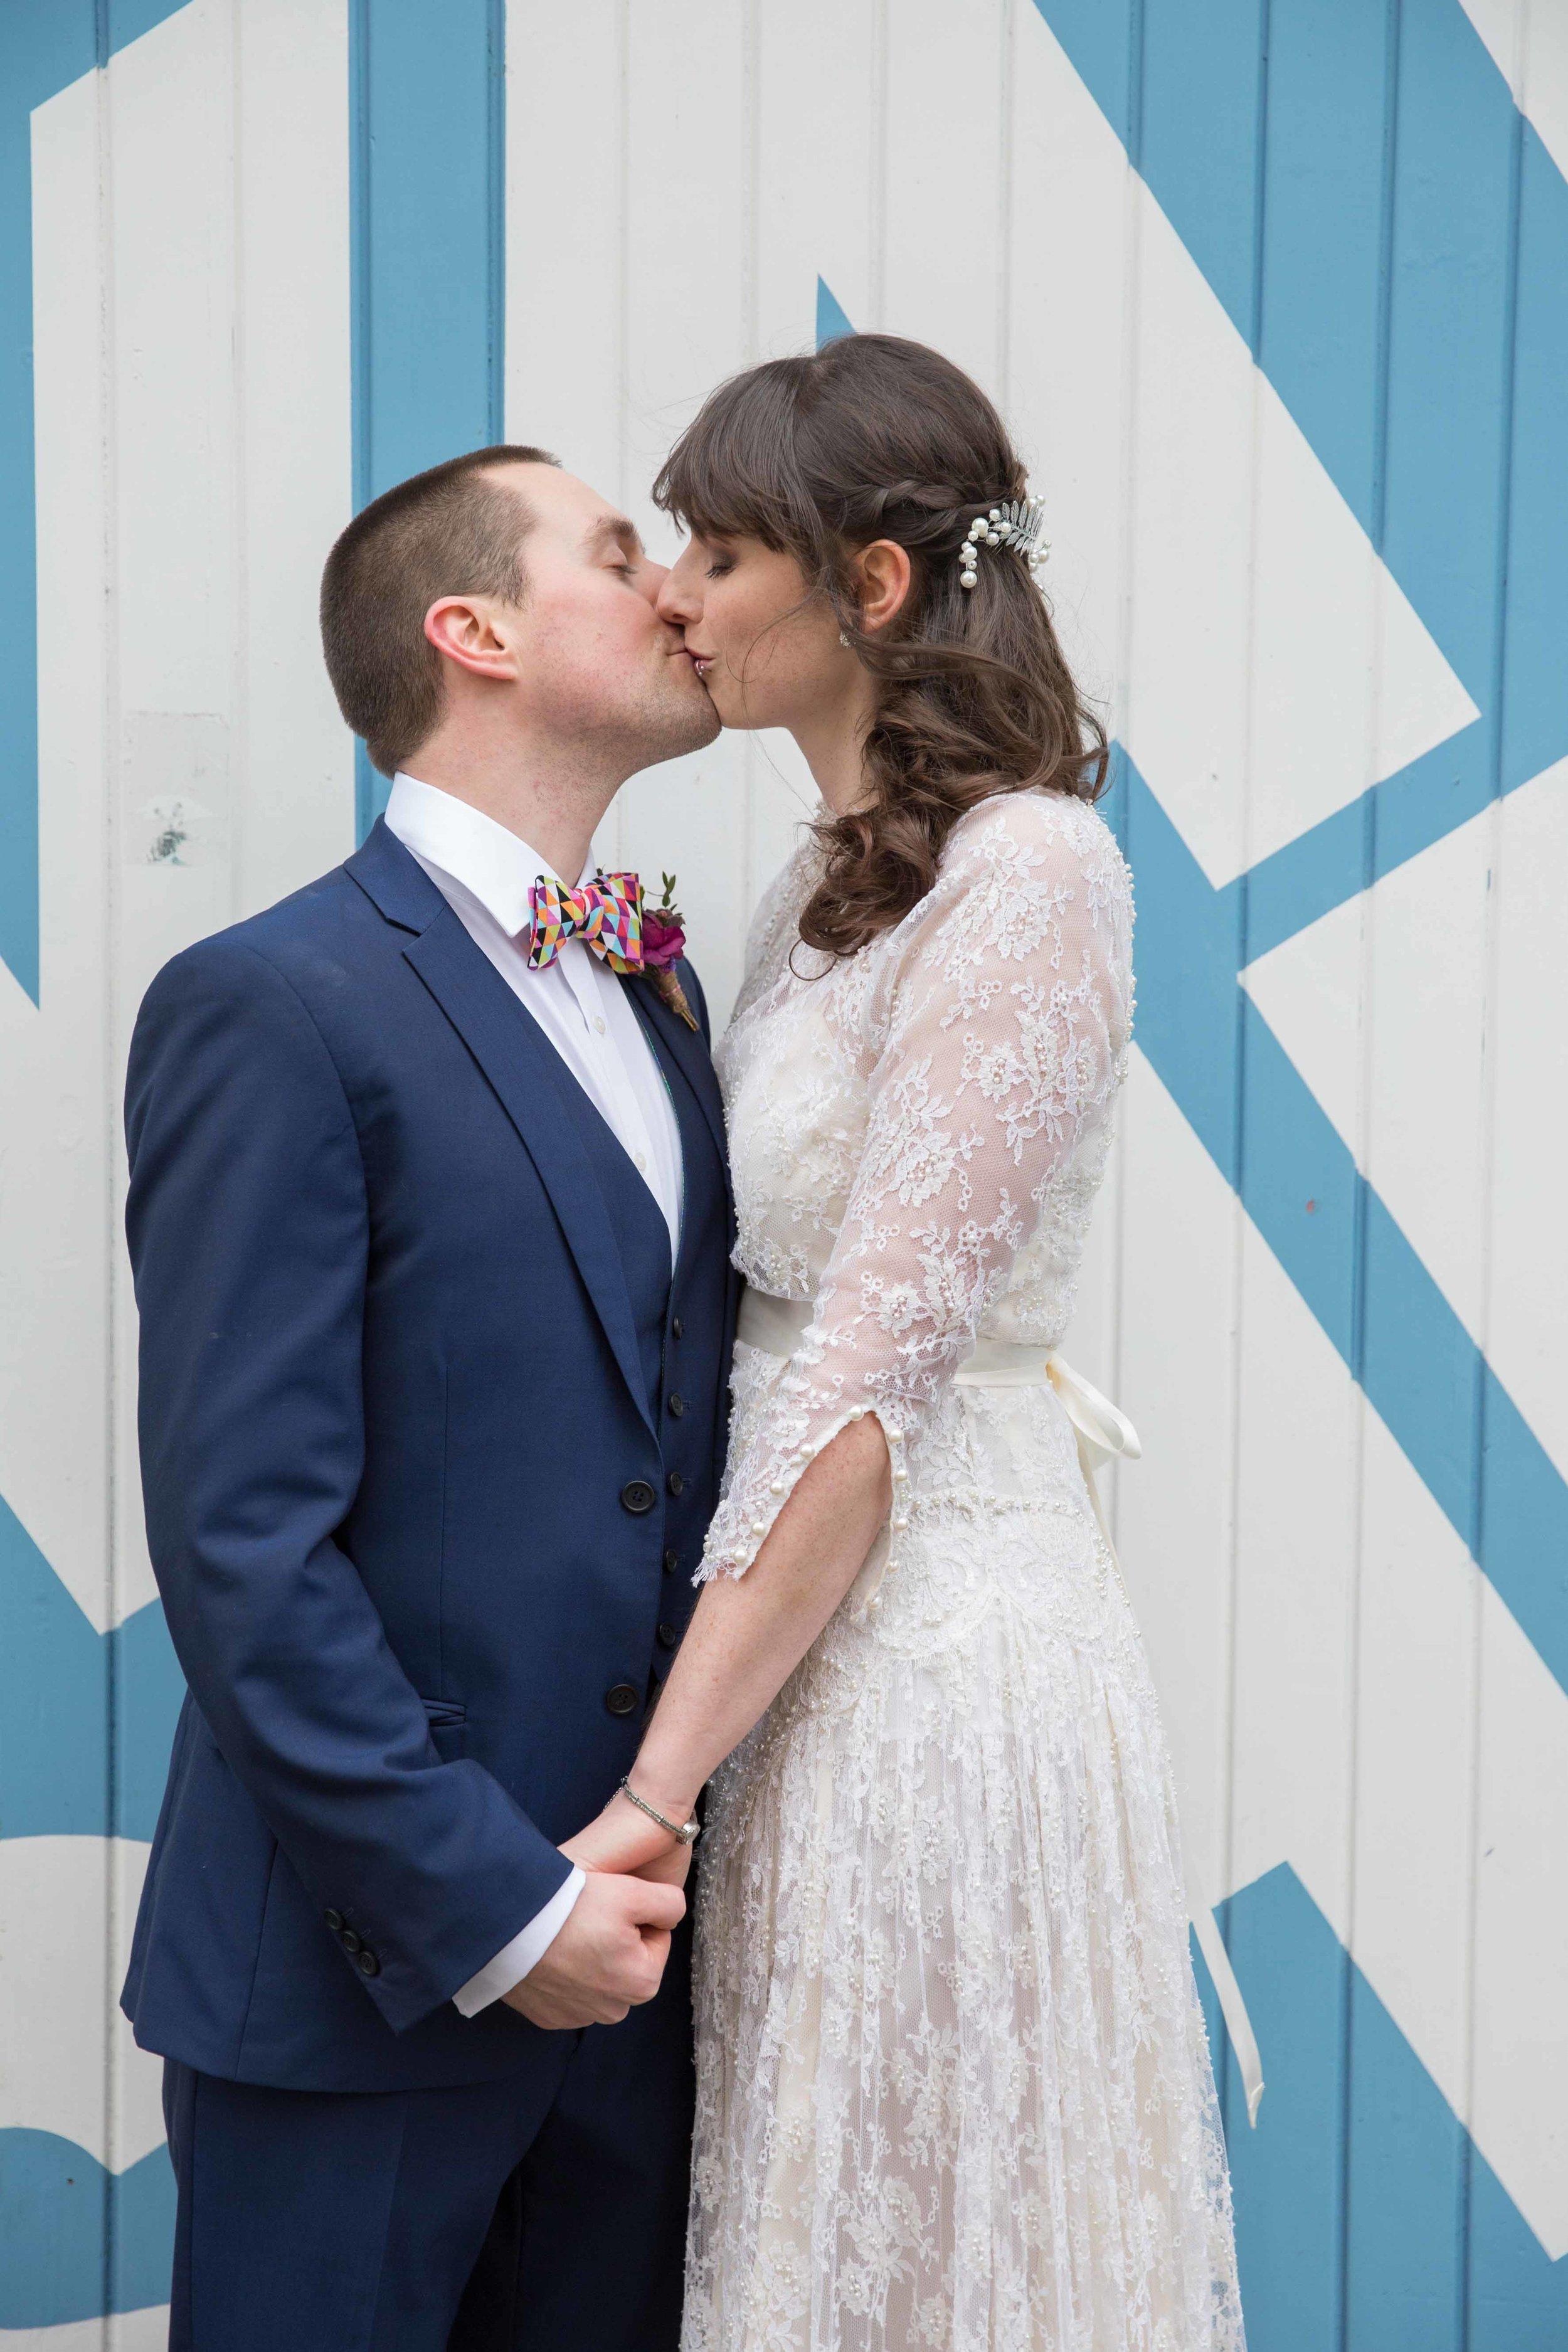 Adam & Faye - Wright Wedding Photography - Bristol Wedding Photographer -259.jpg